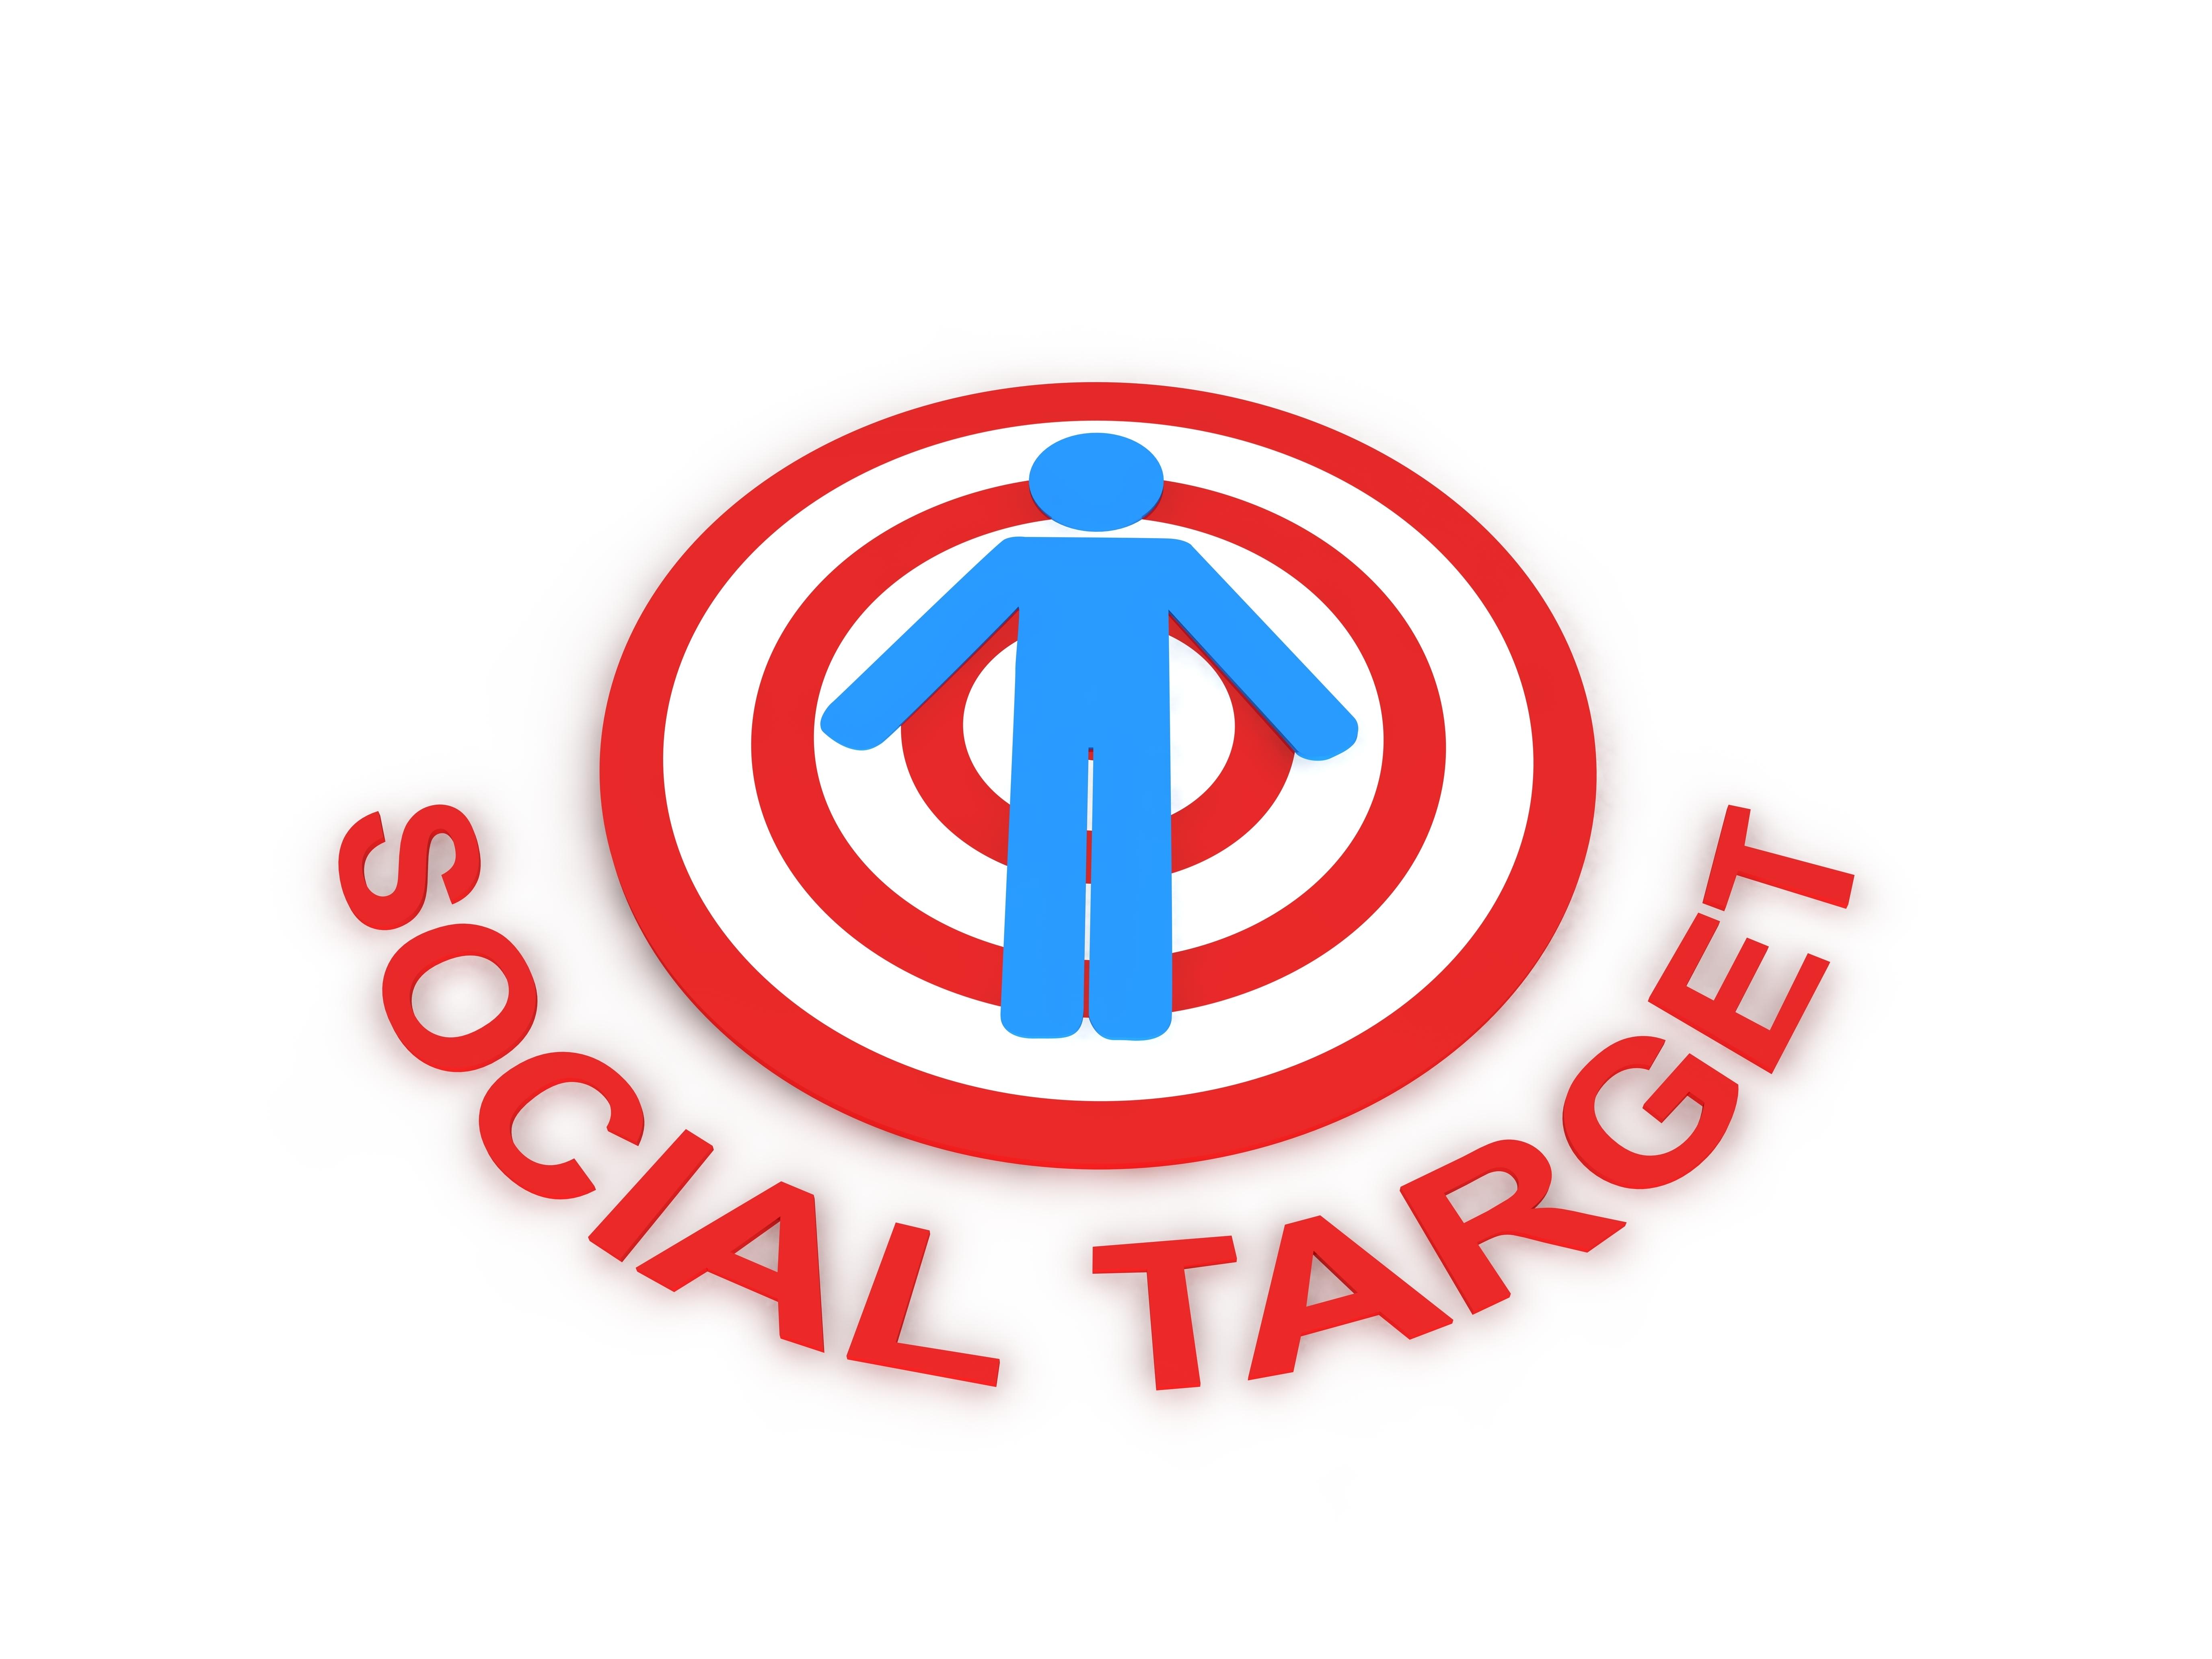 Social Media – An Emerging Tool for Recruitment